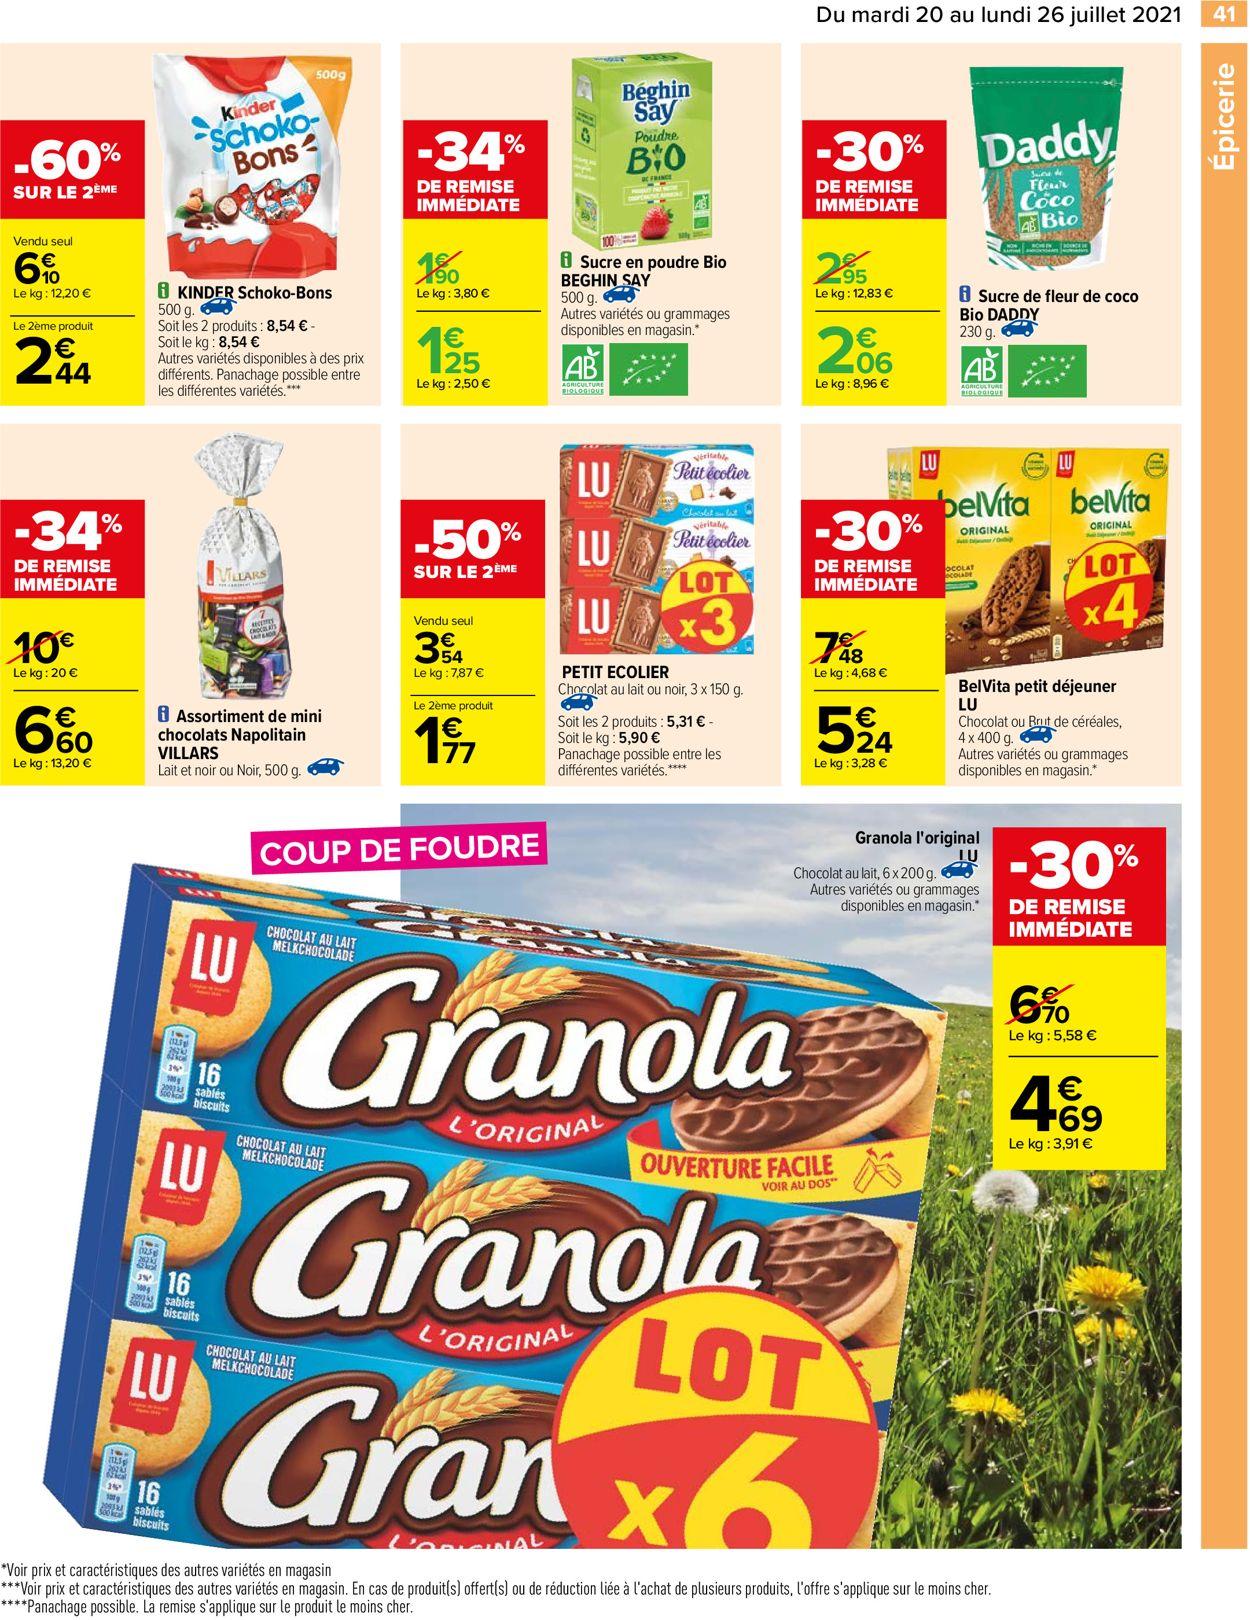 Carrefour Catalogue - 20.07-26.07.2021 (Page 45)